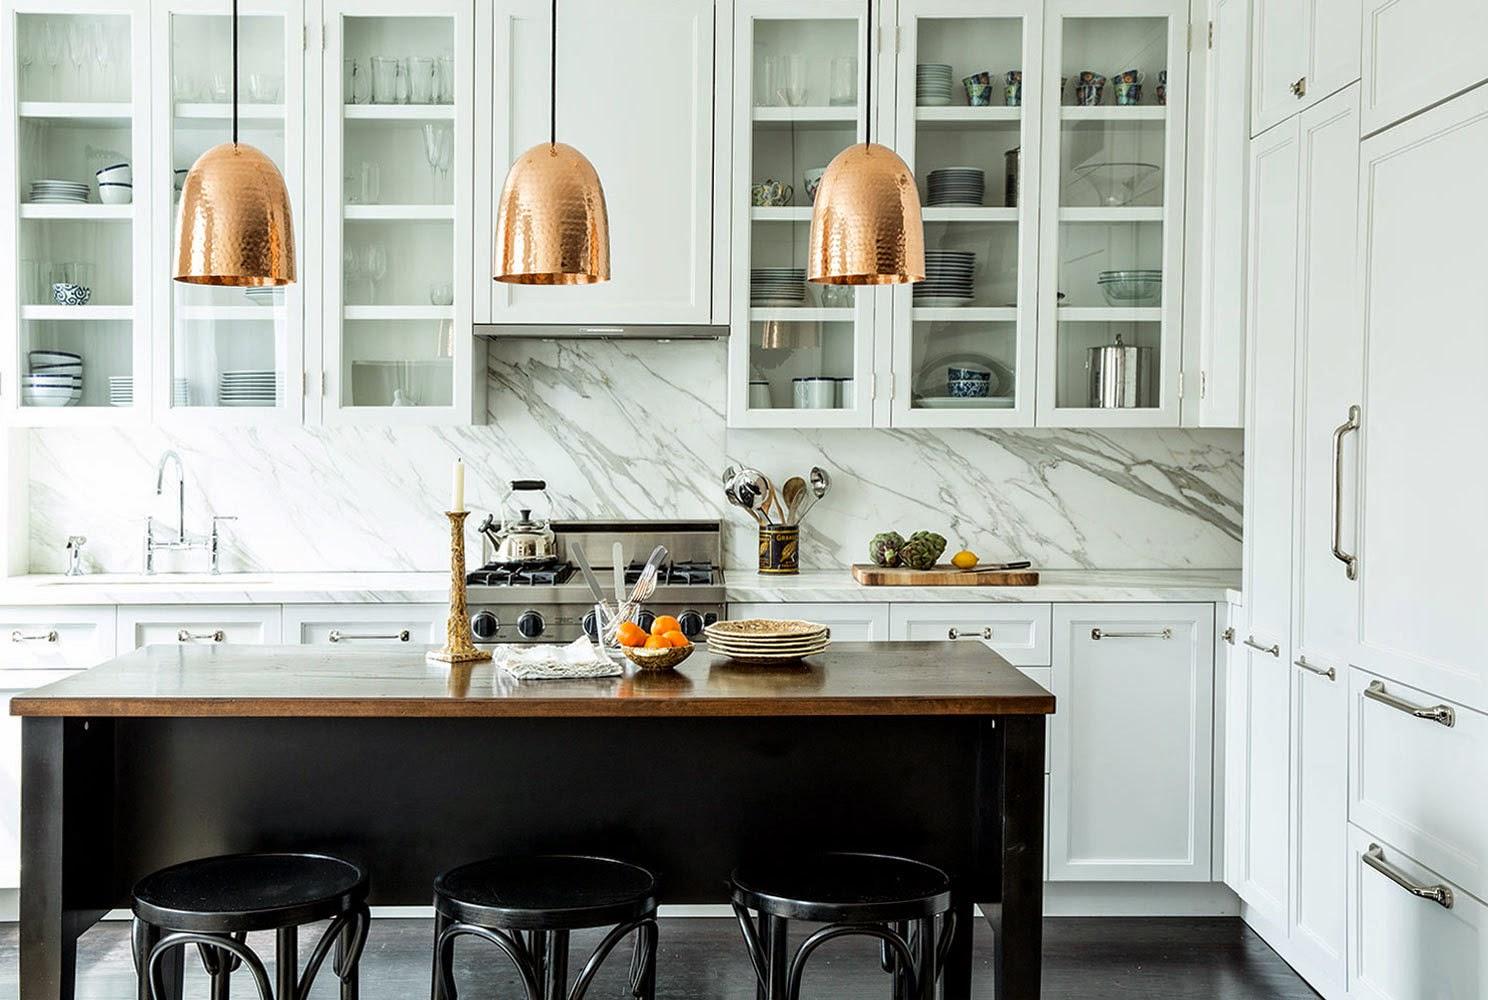 copper pendant lights - kitchen